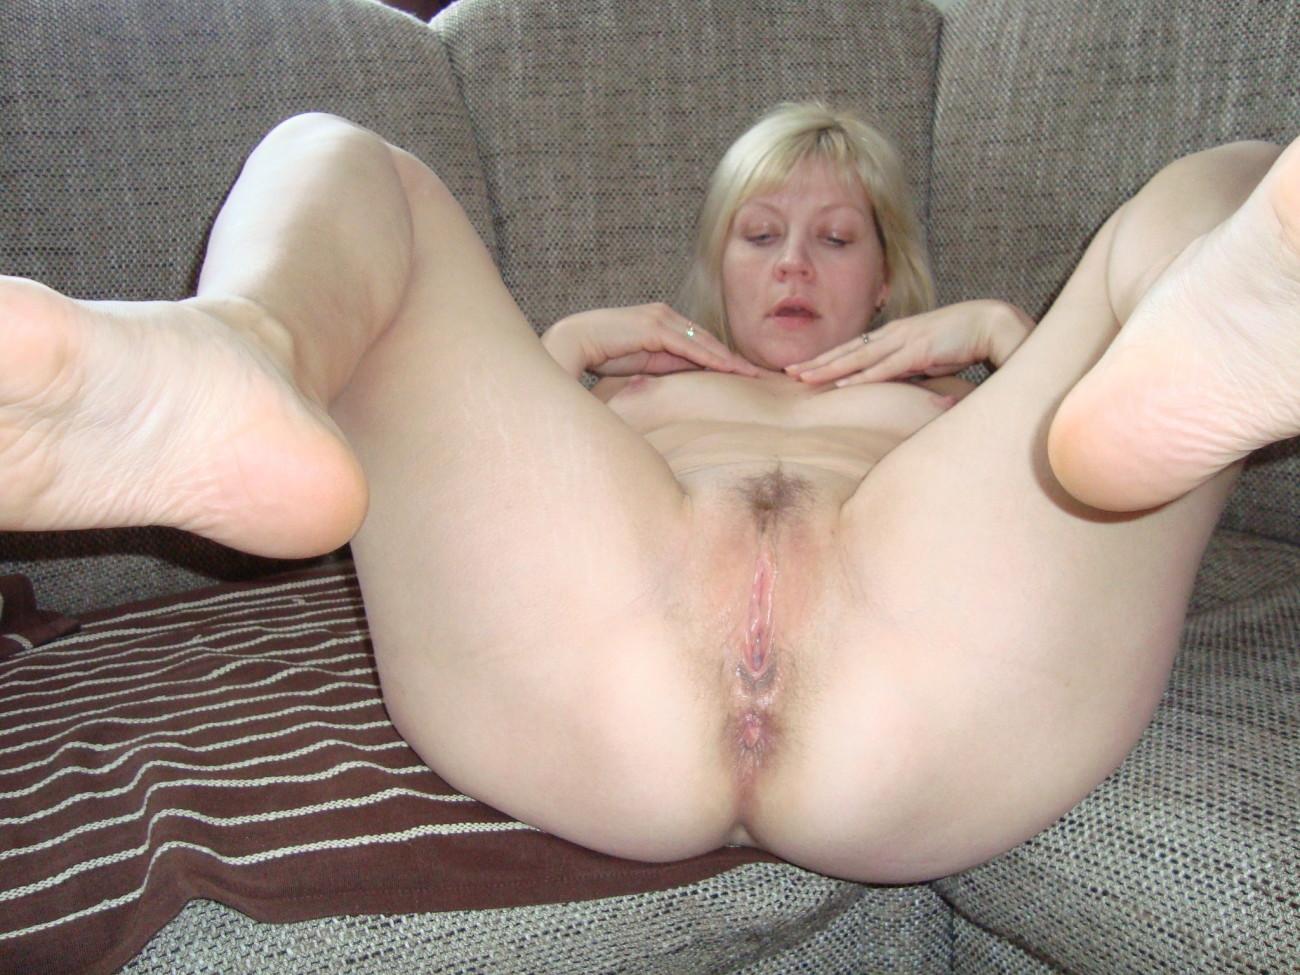 23 - pussies wives voyeur amateur..